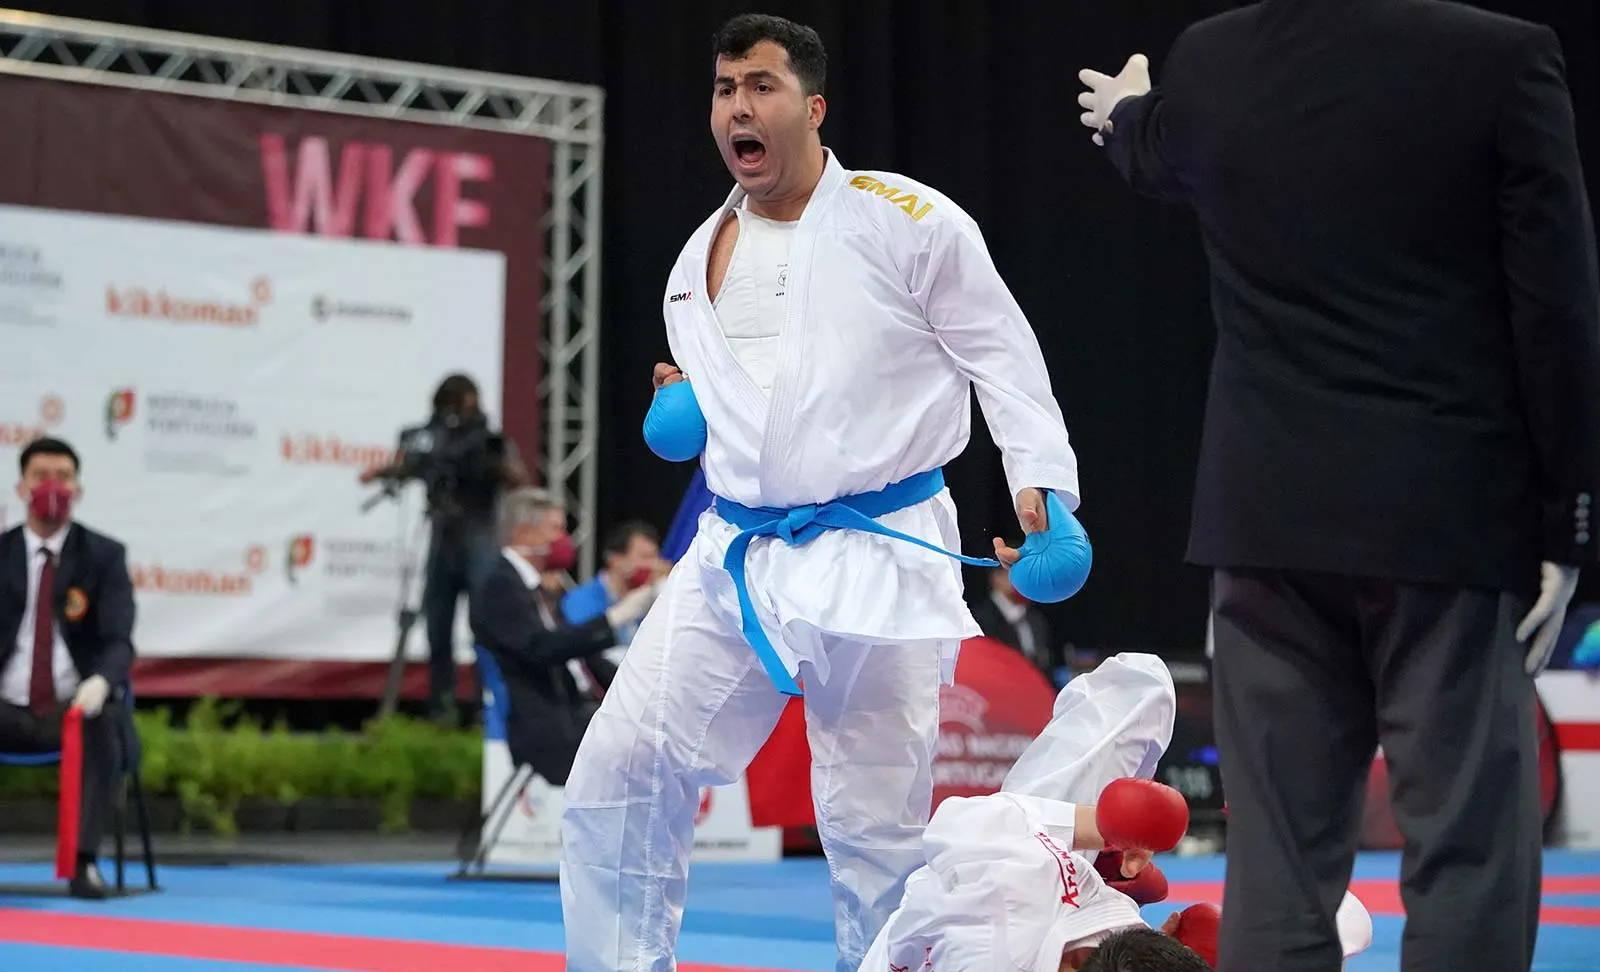 olympic karate athlete Sajad Ganjzadehcelebrates victory